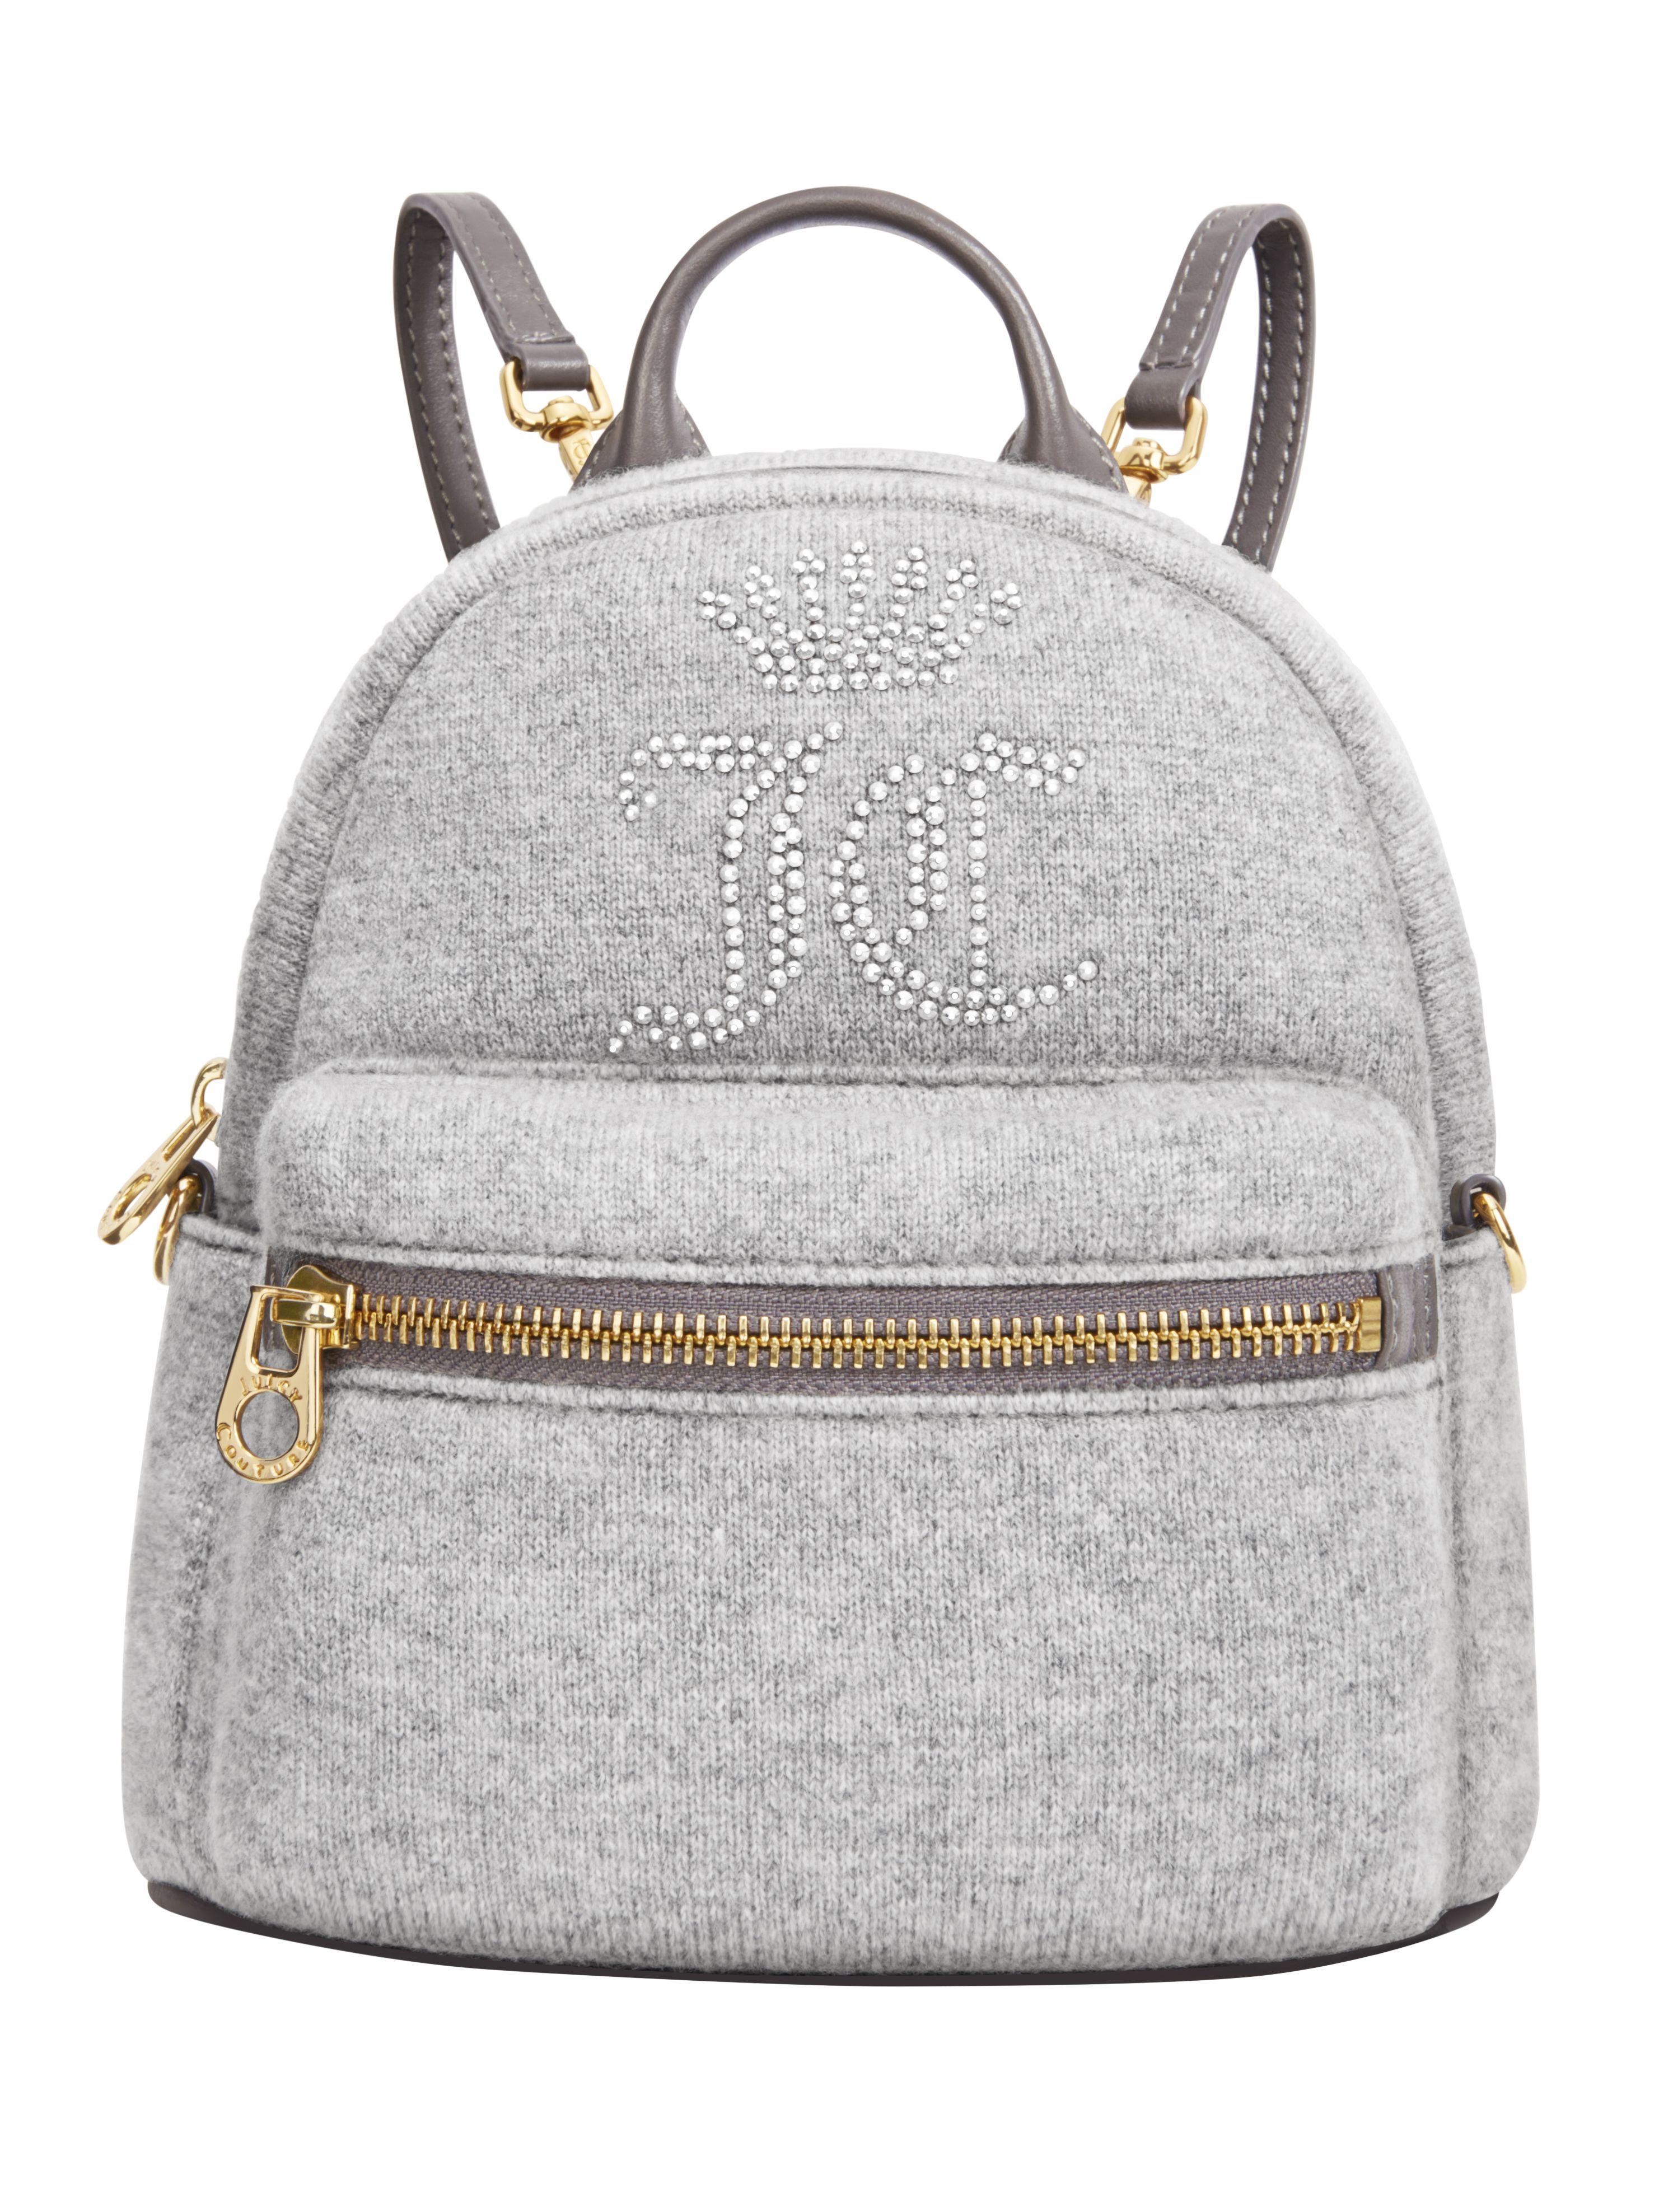 3c1fc4184 Cashmere Mini Backpack With Crystals From Swarovski® | Swarovski ...